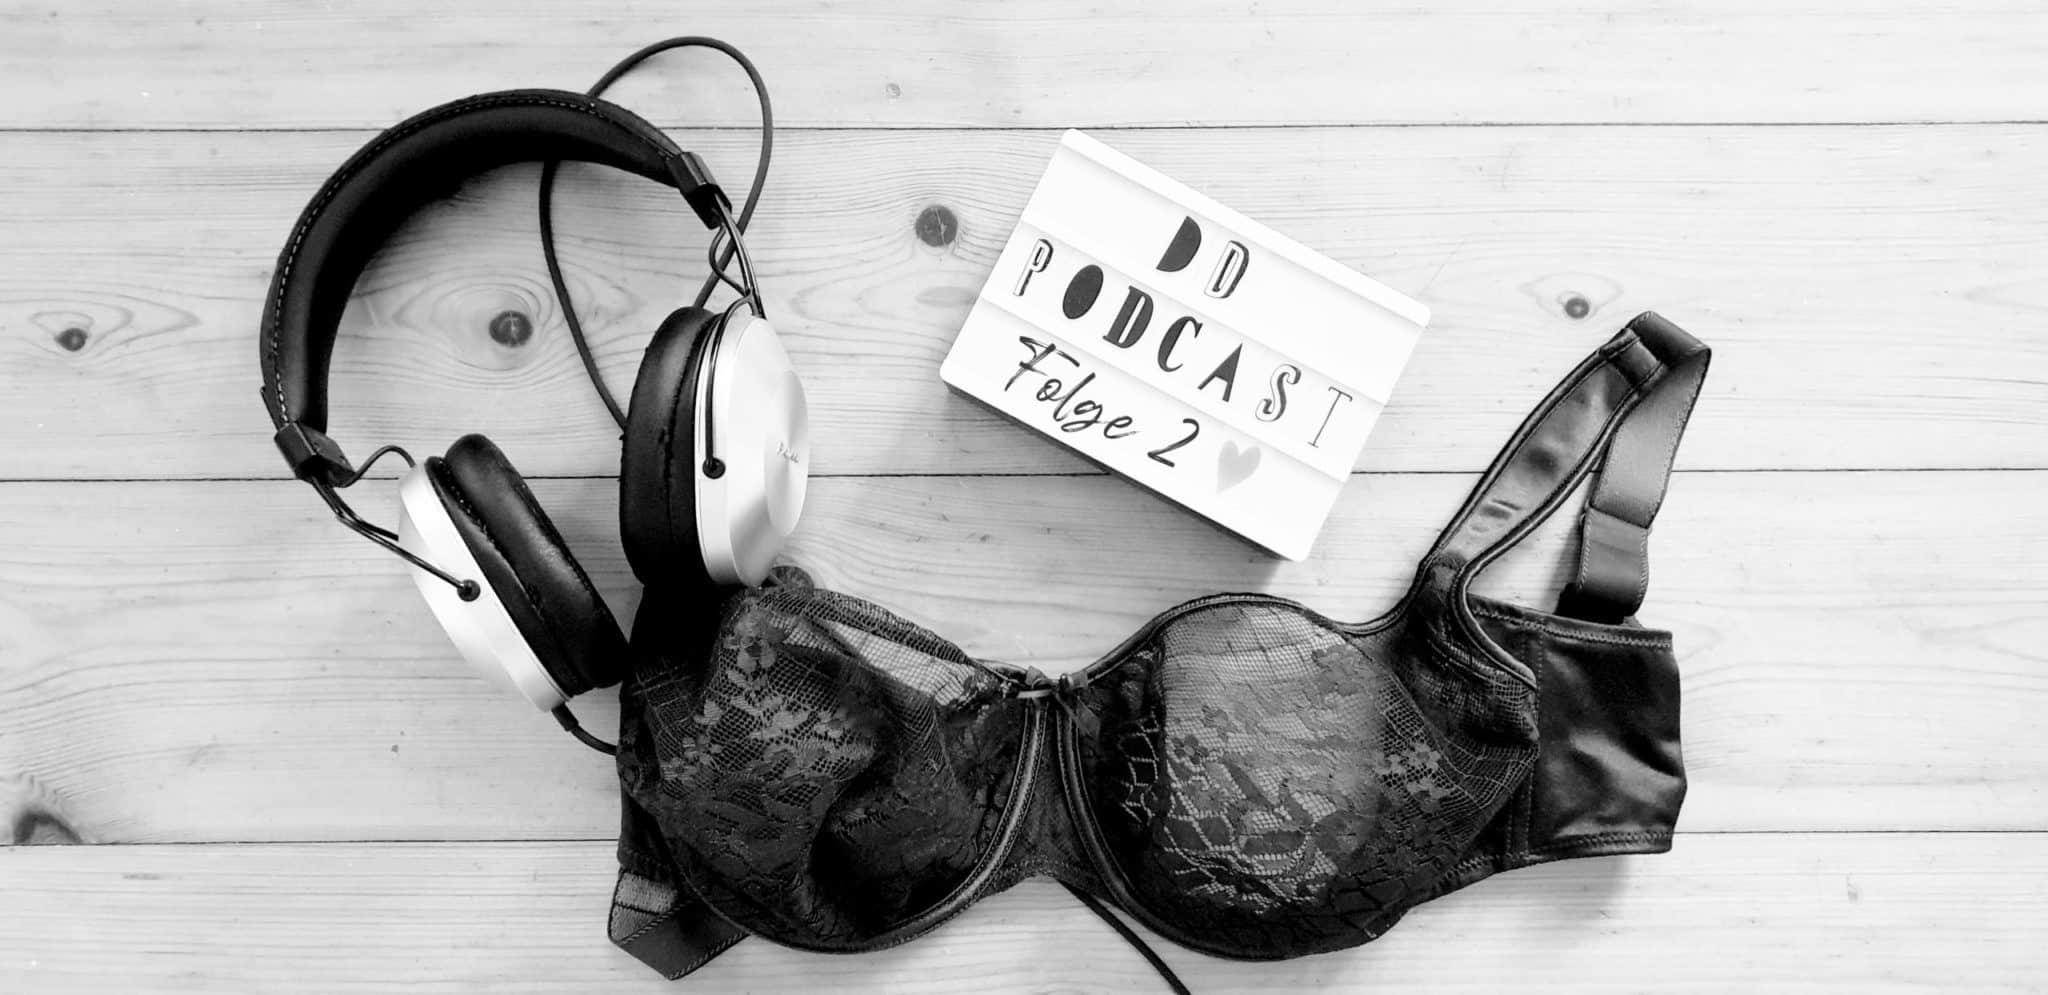 Podcastfolge 2